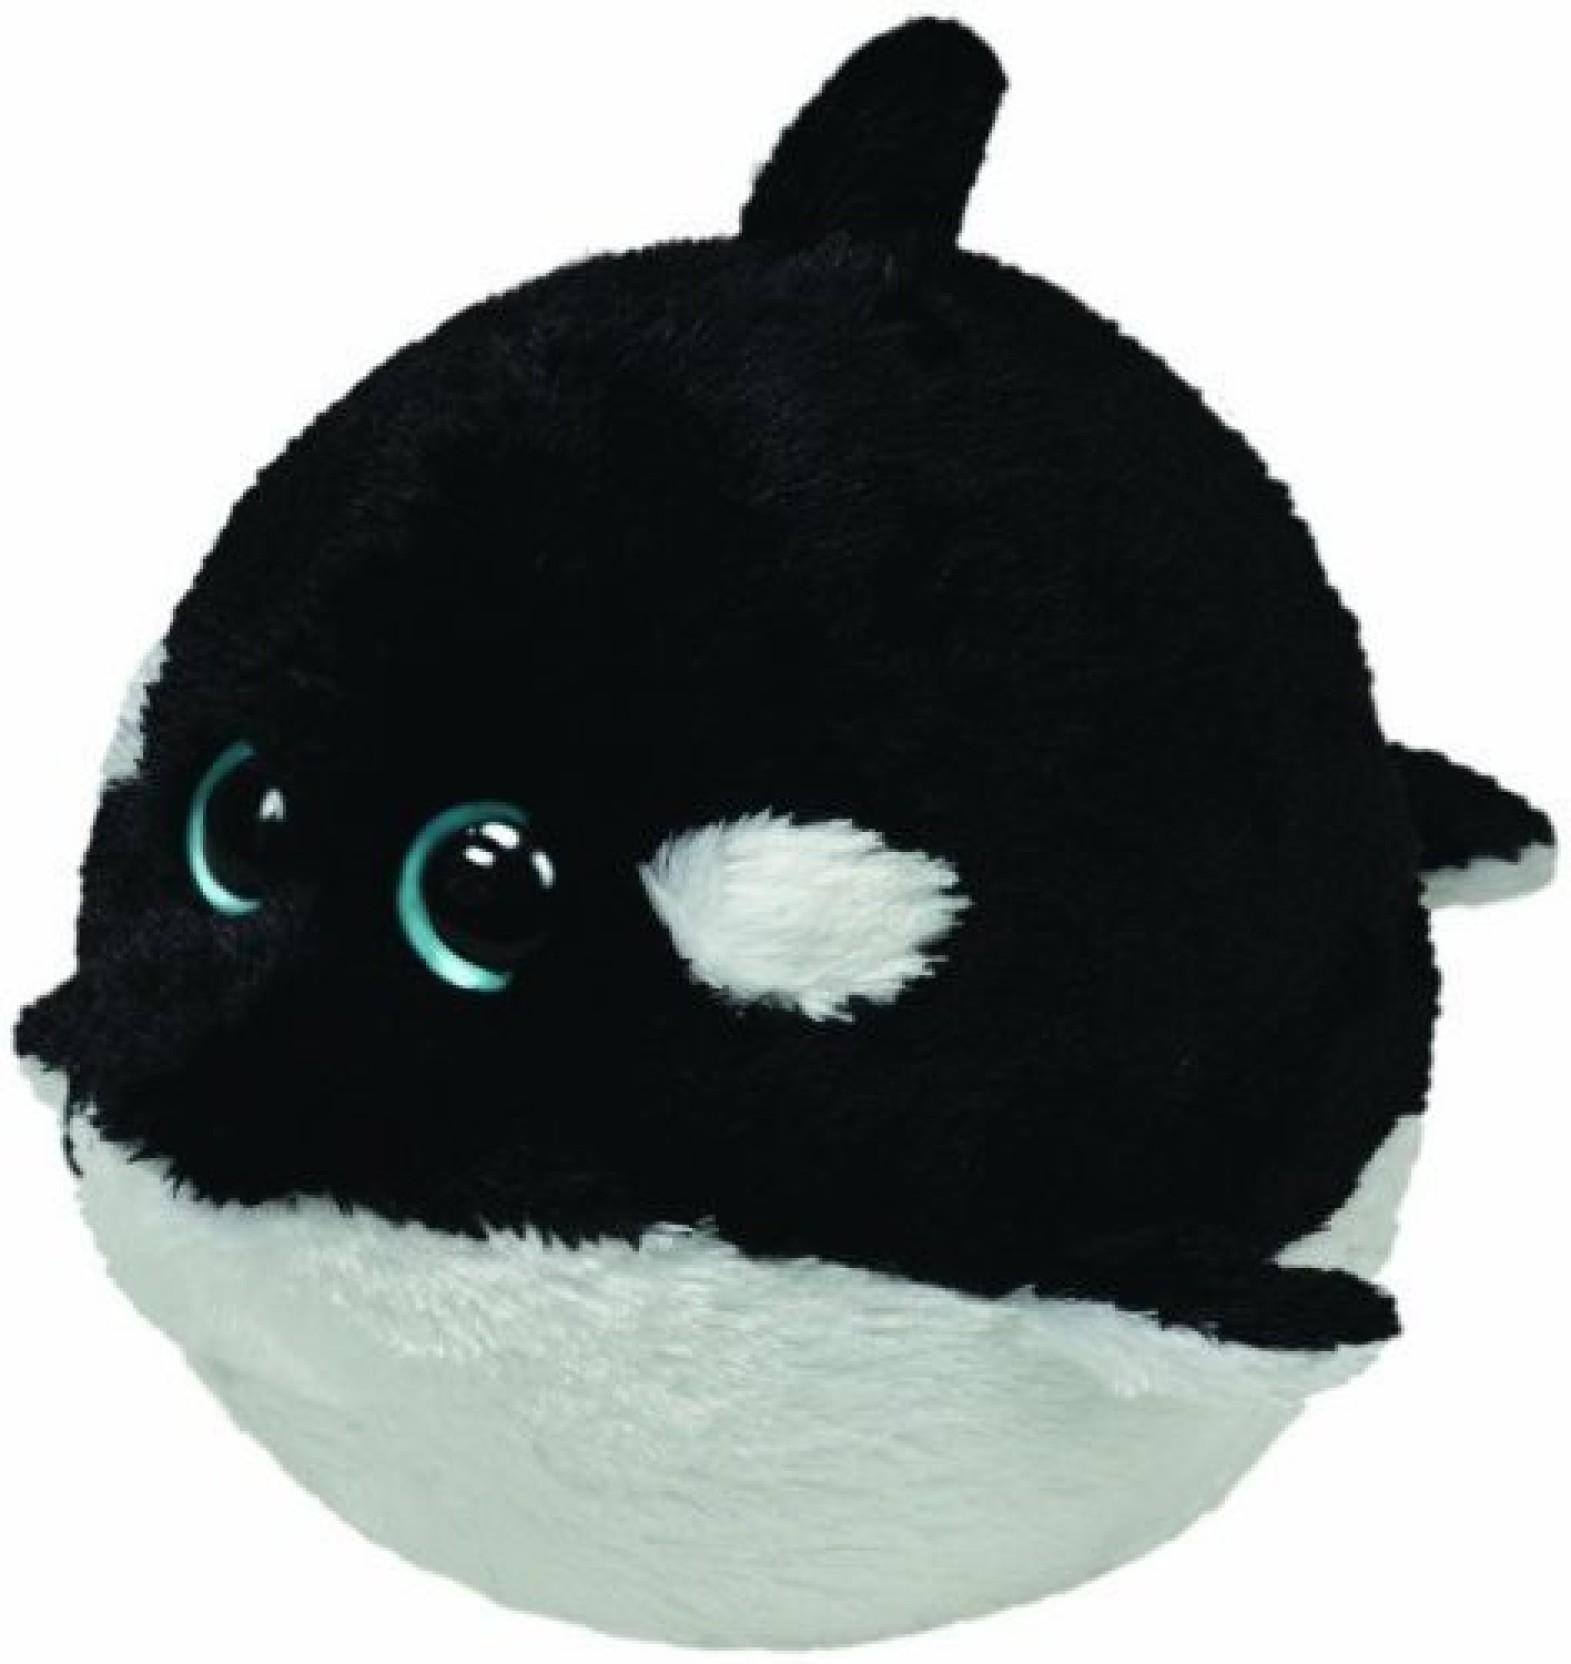 c46cf10bb0b TY Beanie Babies Splash The Whale - Splash The Whale . Buy Whale ...